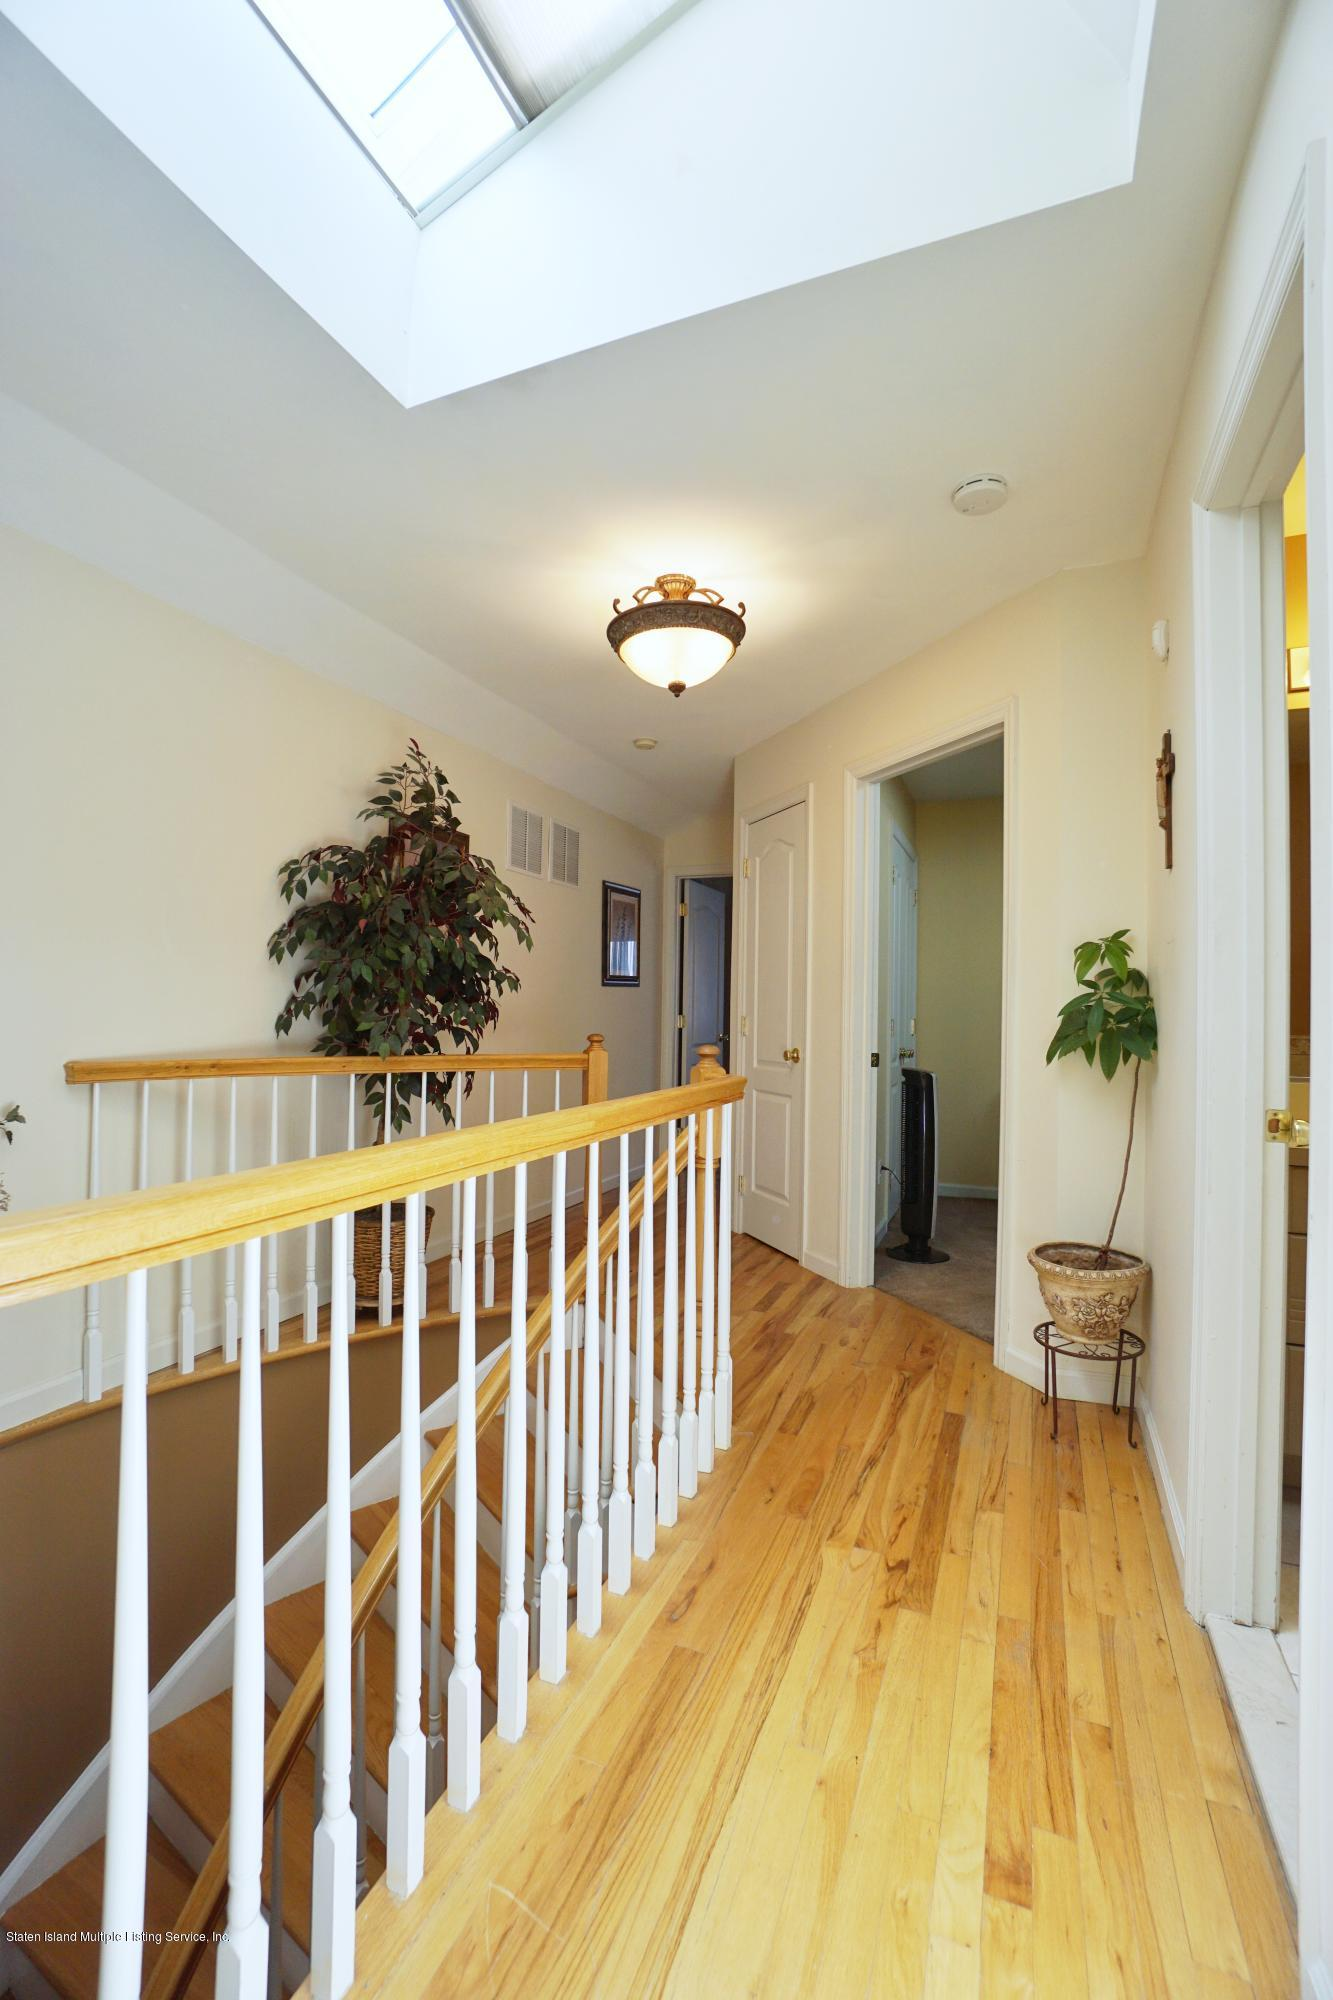 Single Family - Attached 114 Herrick Avenue  Staten Island, NY 10309, MLS-1137235-9